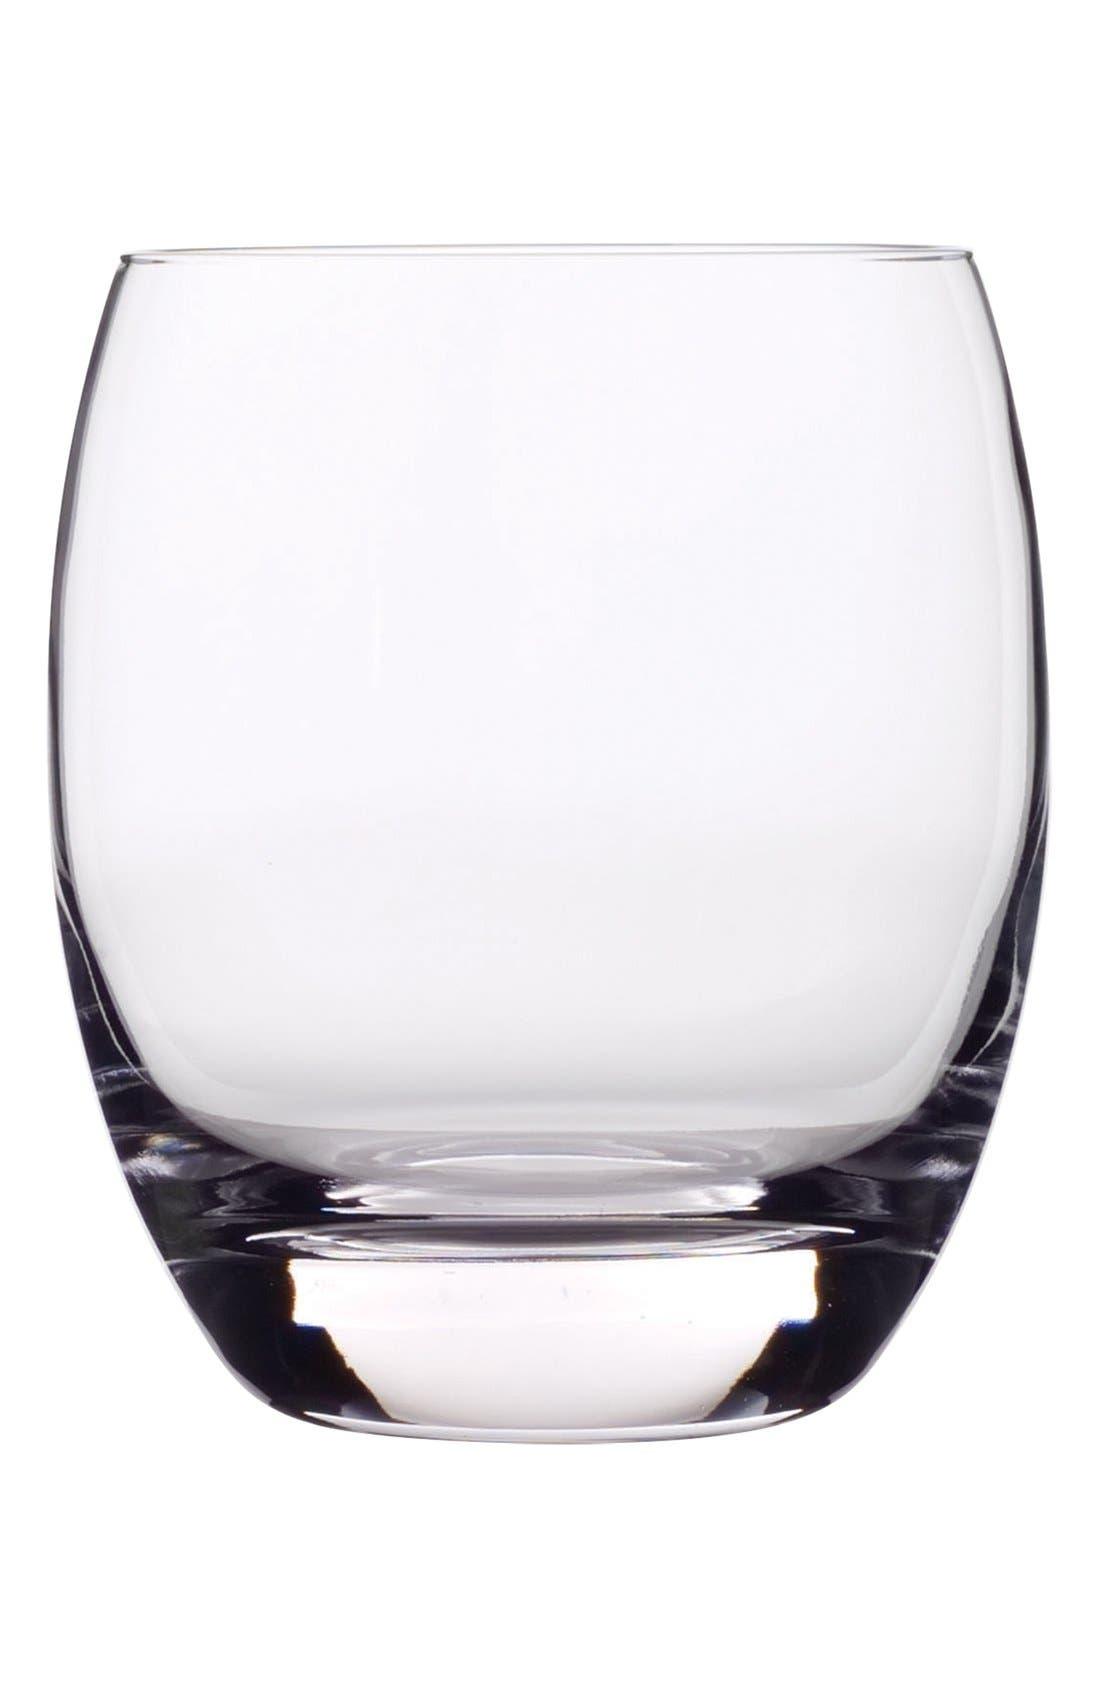 Main Image - Luigi Bormioli 'Crescendo' Double Old Fashioned Glasses (Set of 4)